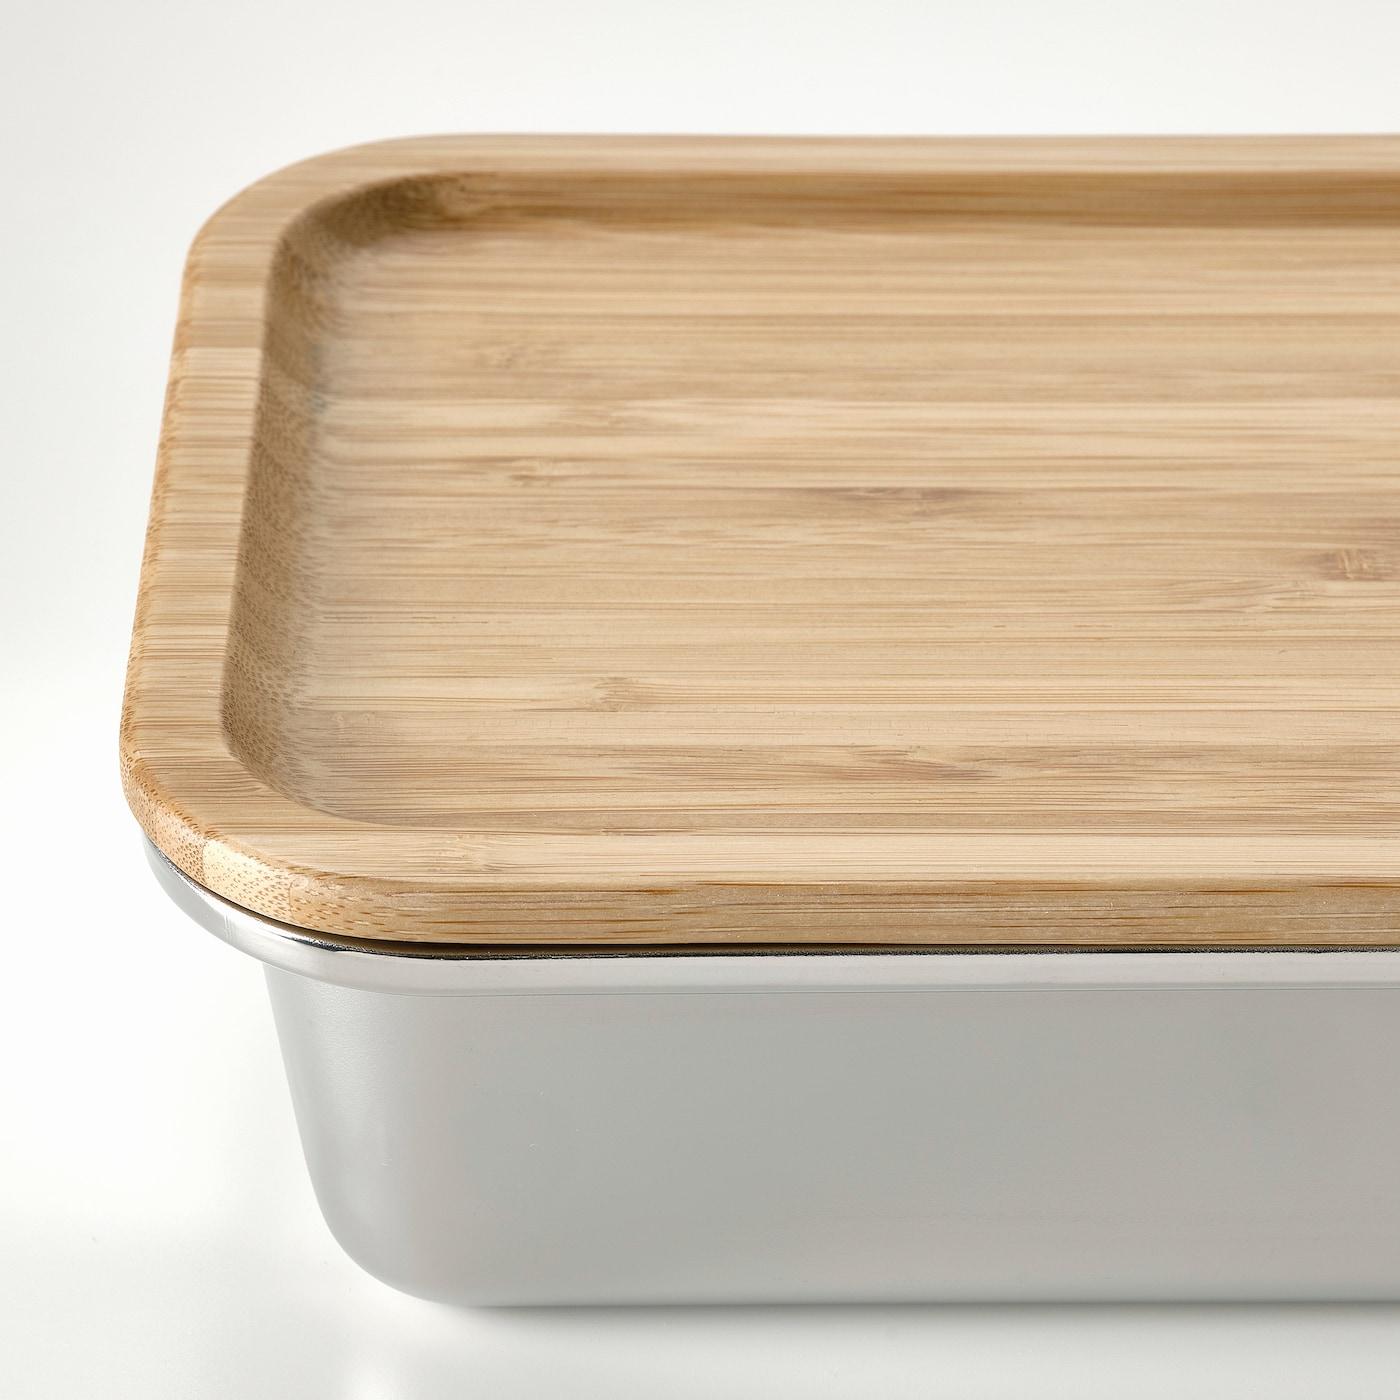 IKEA 365+ Lid, rectangular/bamboo